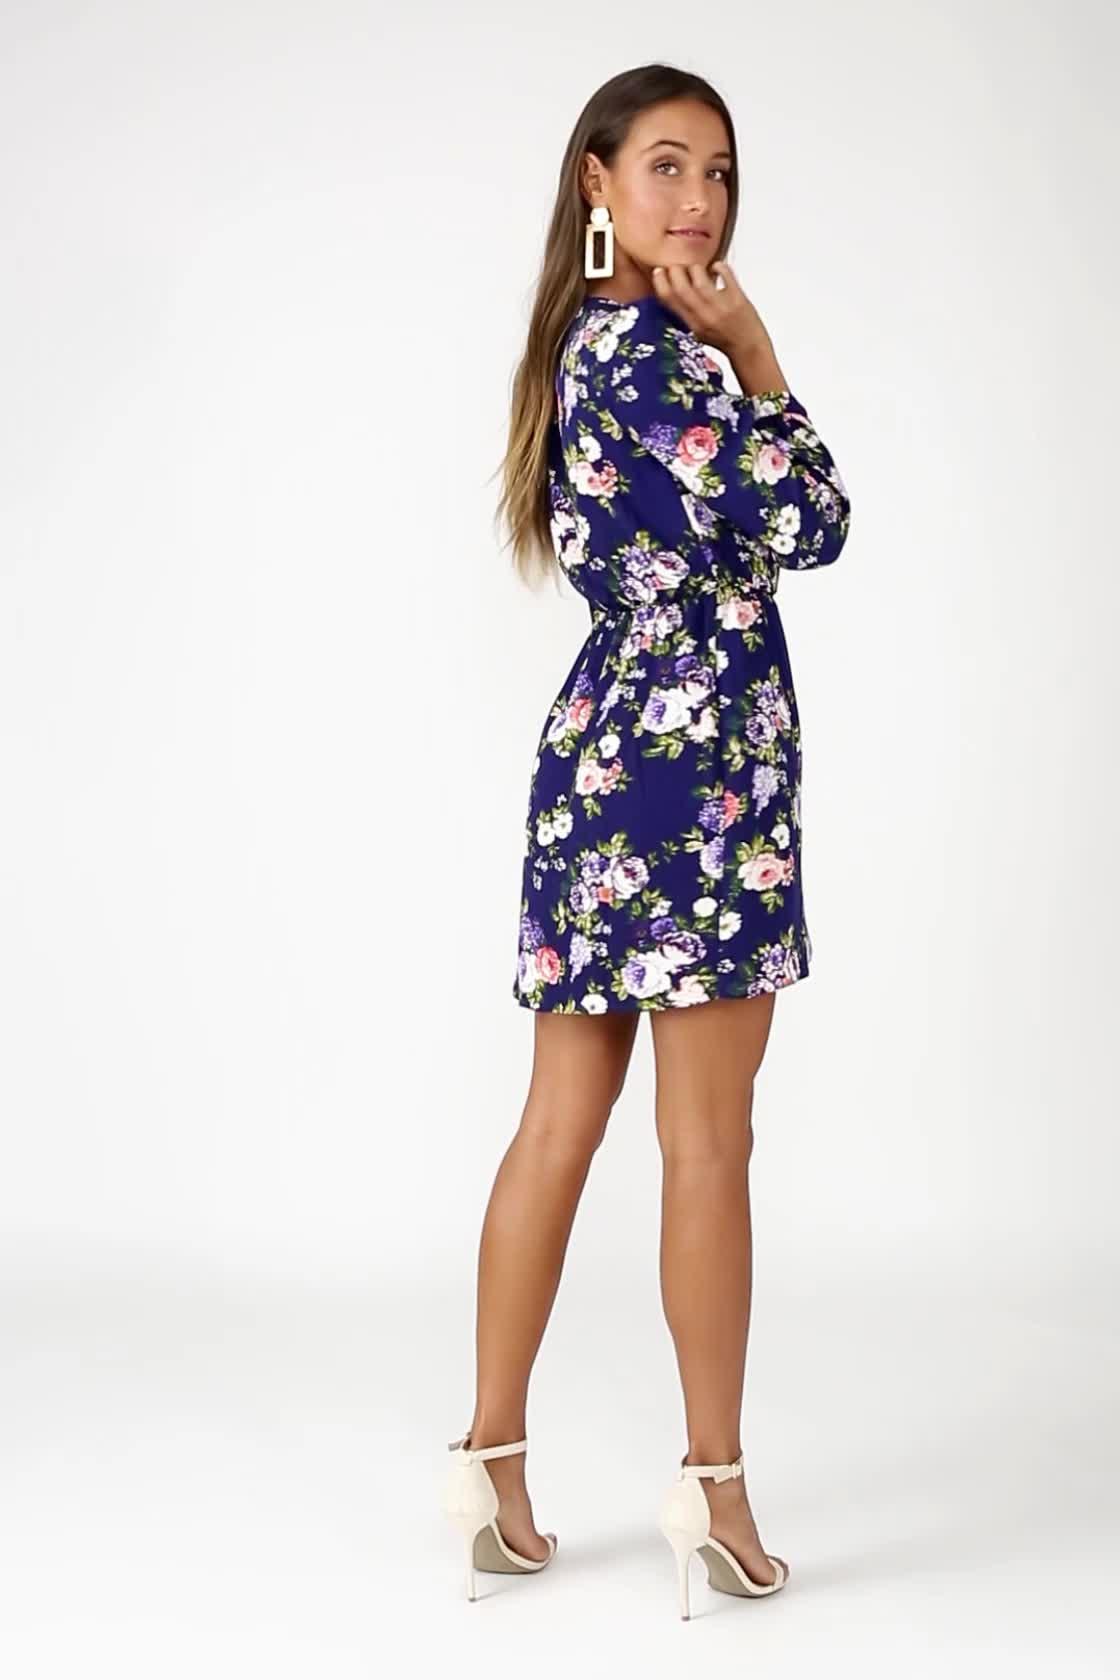 da48c31dc4e70 Cute Burgundy Dress - Wrap Dress - Long Sleeve Dress - Polka Dot ...